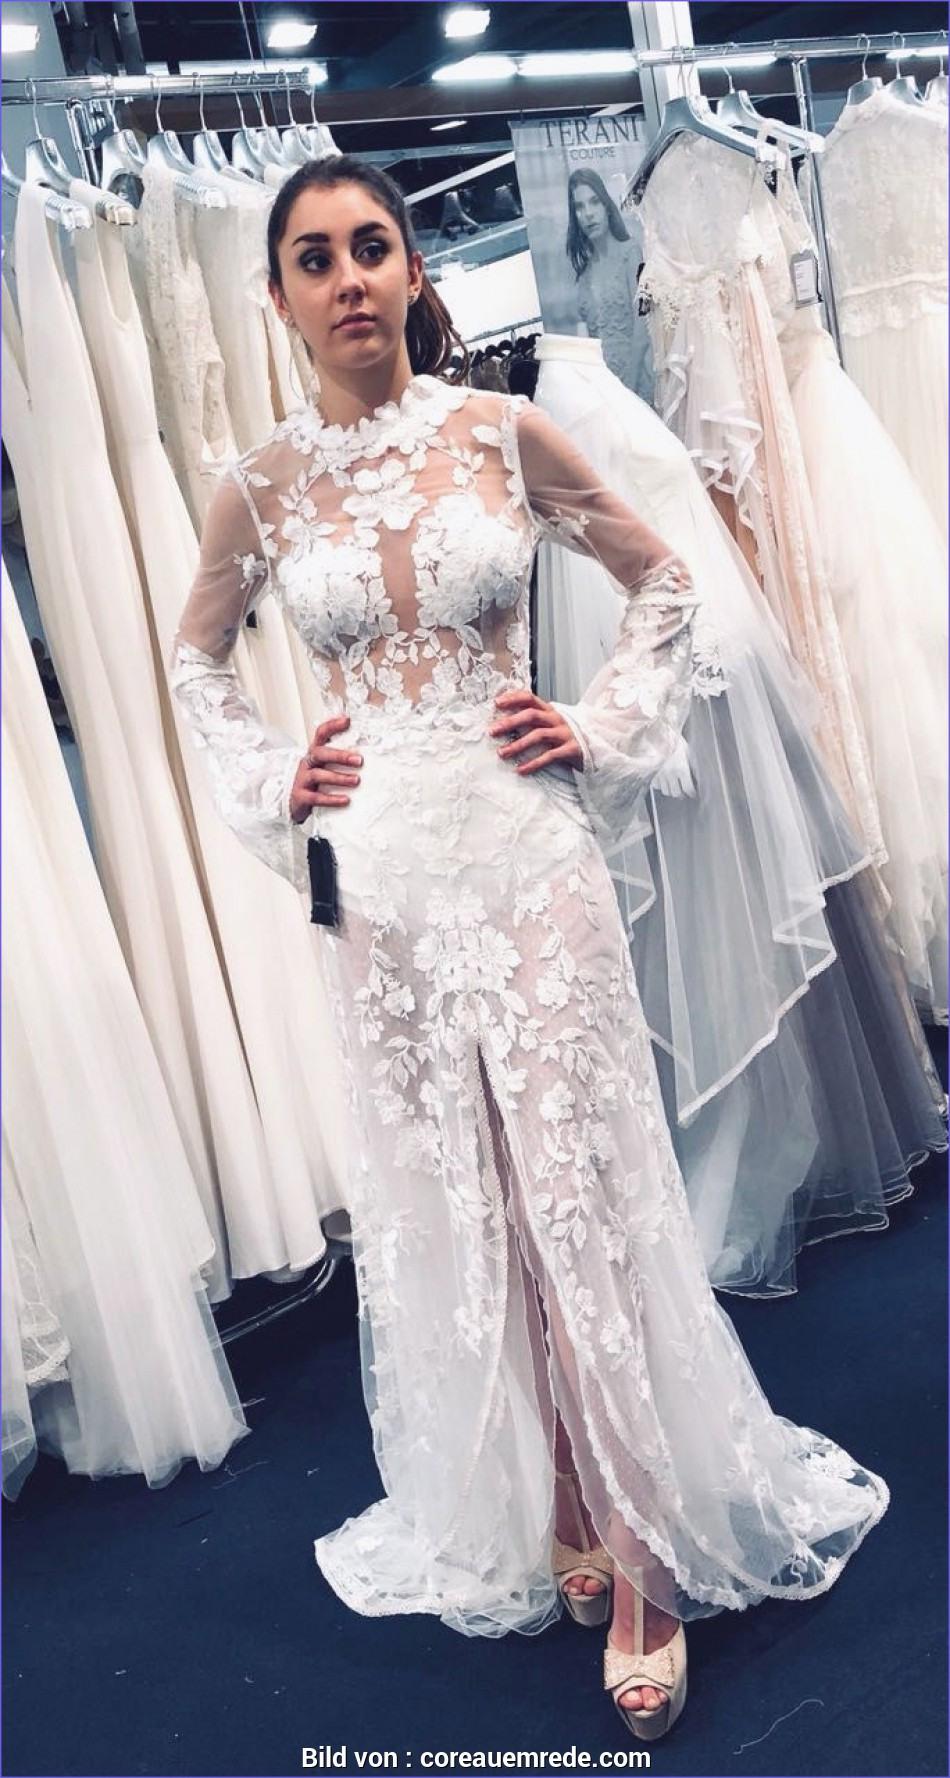 Brautkleid Leipzig - Atelier 9 Kleider - Individuelle - Abendkleid